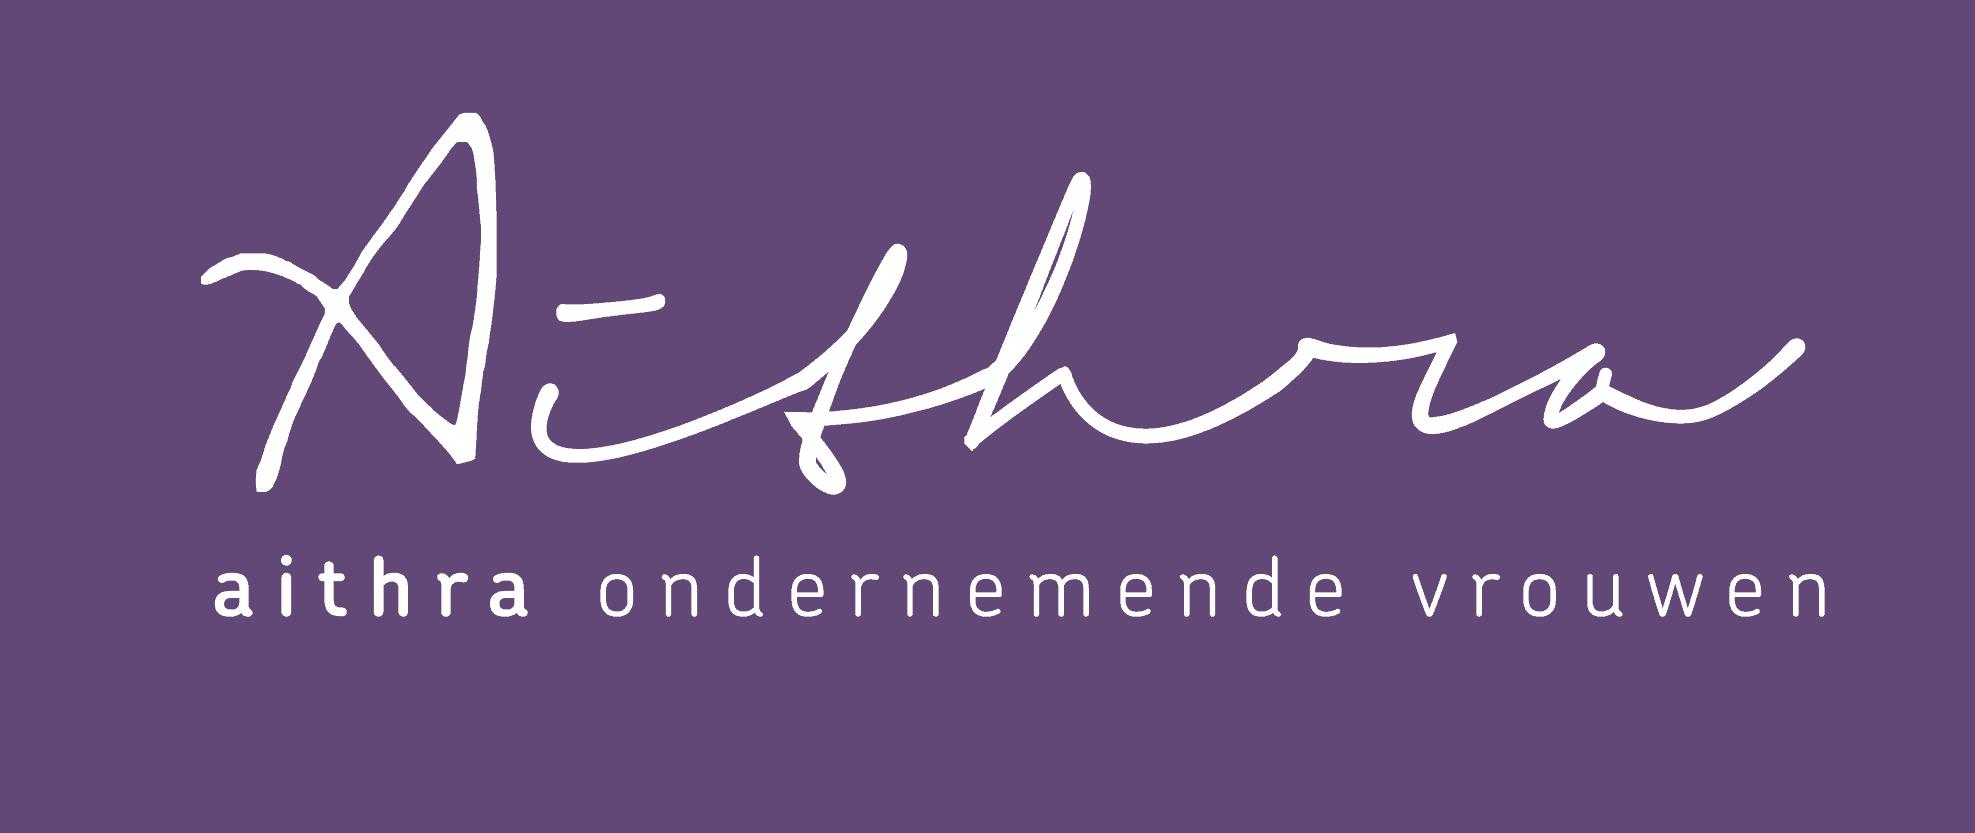 https://www.virtualstars.nl/wp-content/uploads/2019/09/Nieuwe-logo-Aithra-03.png